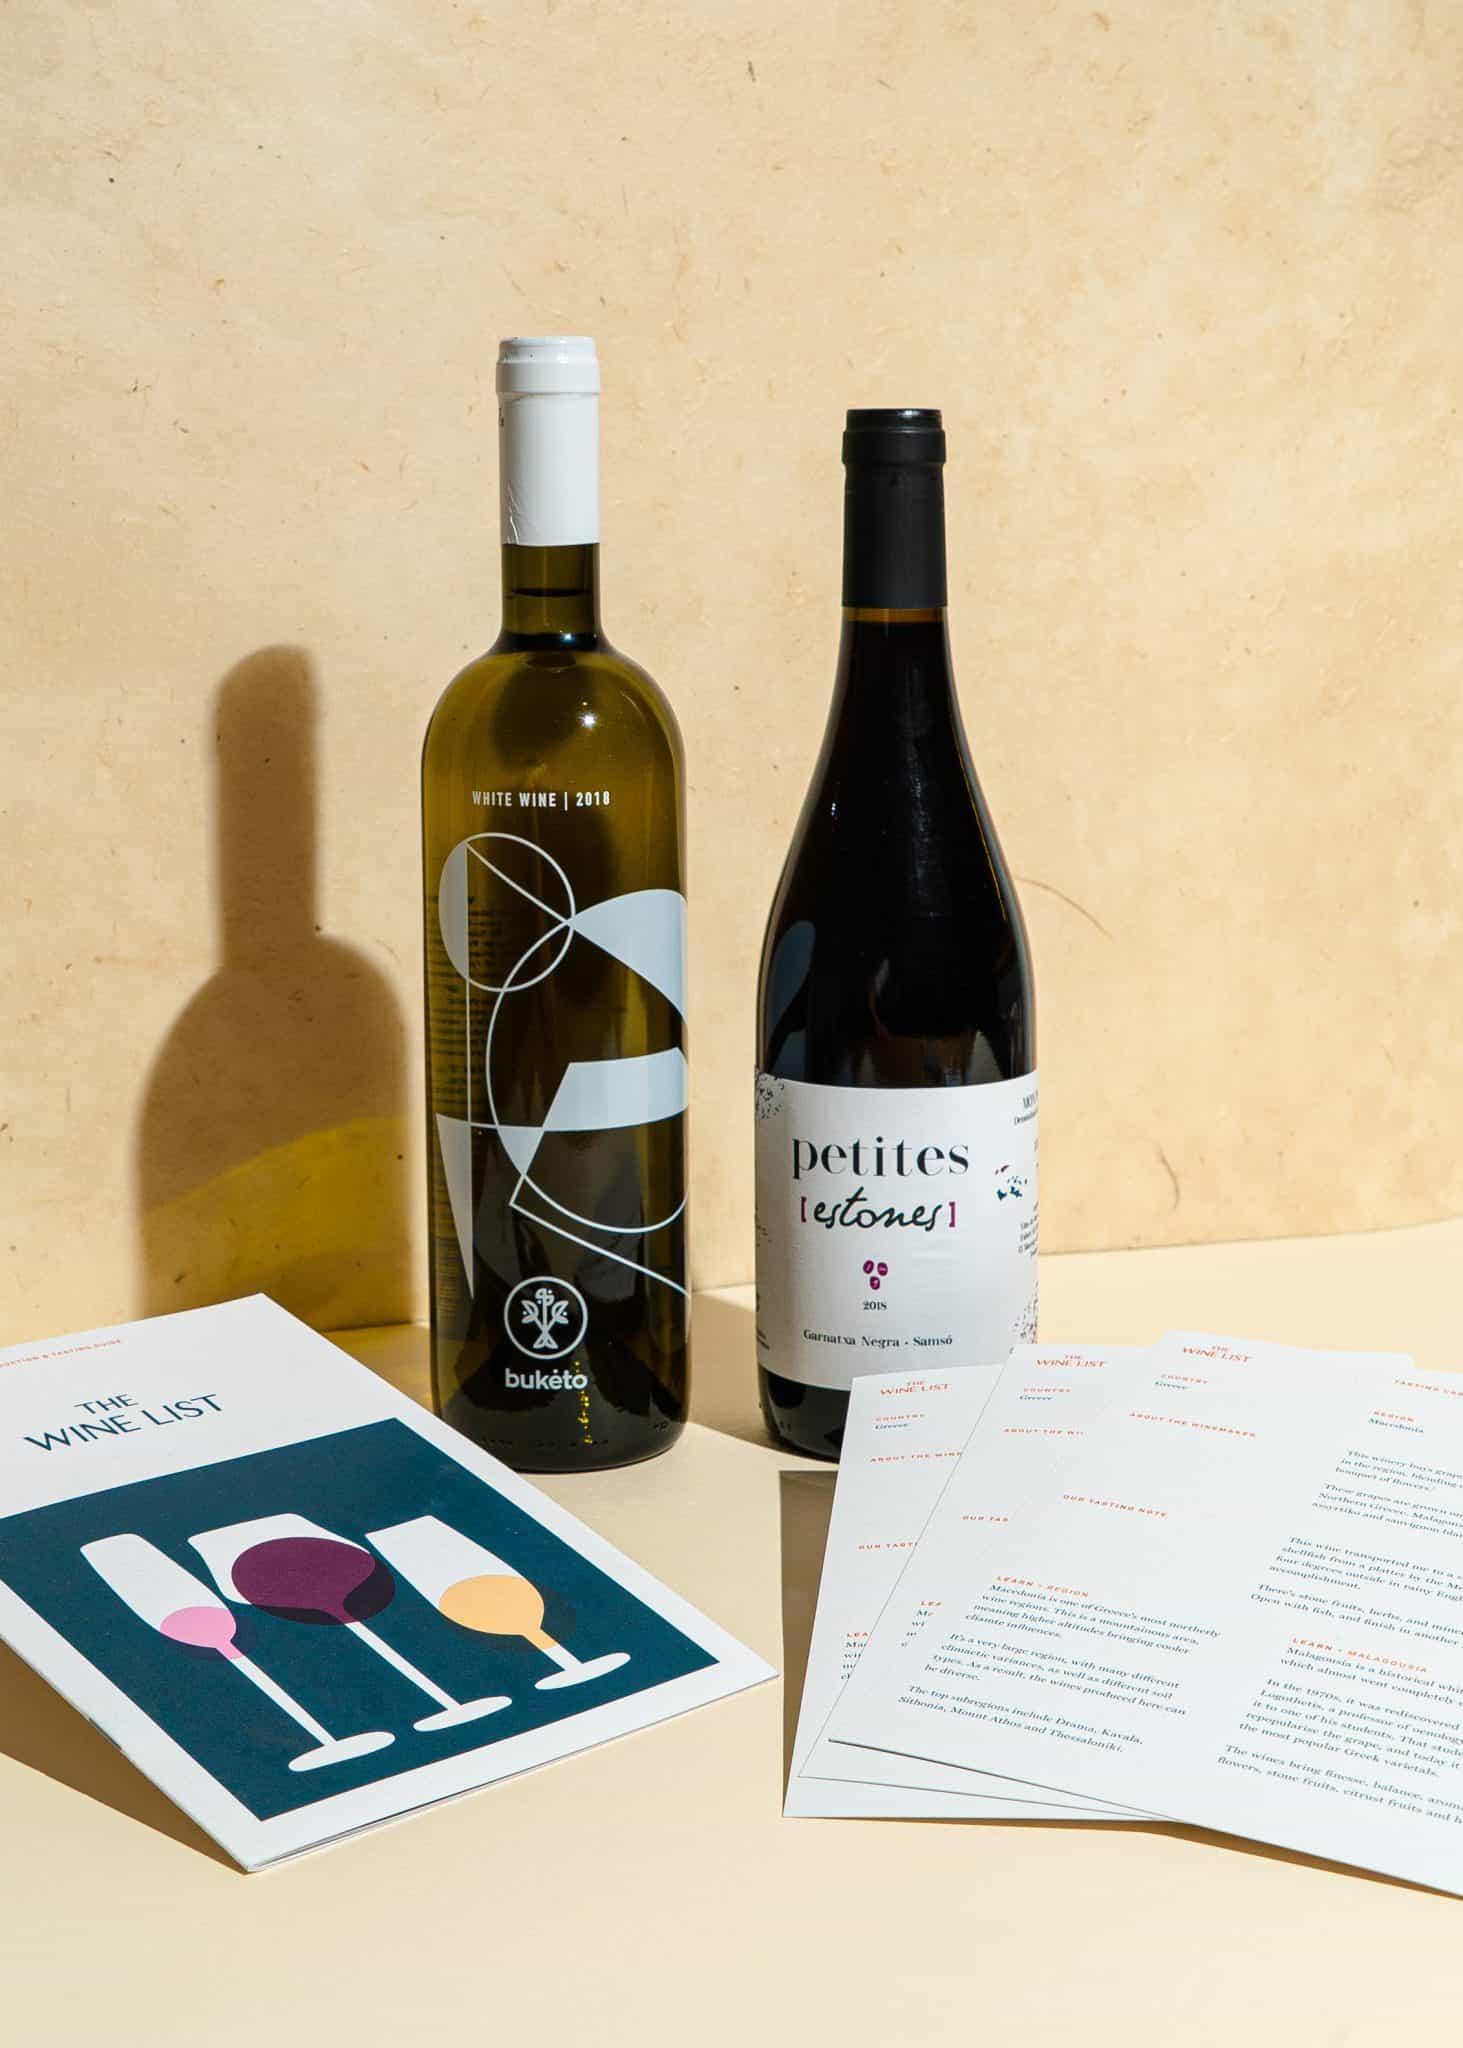 The Wine List